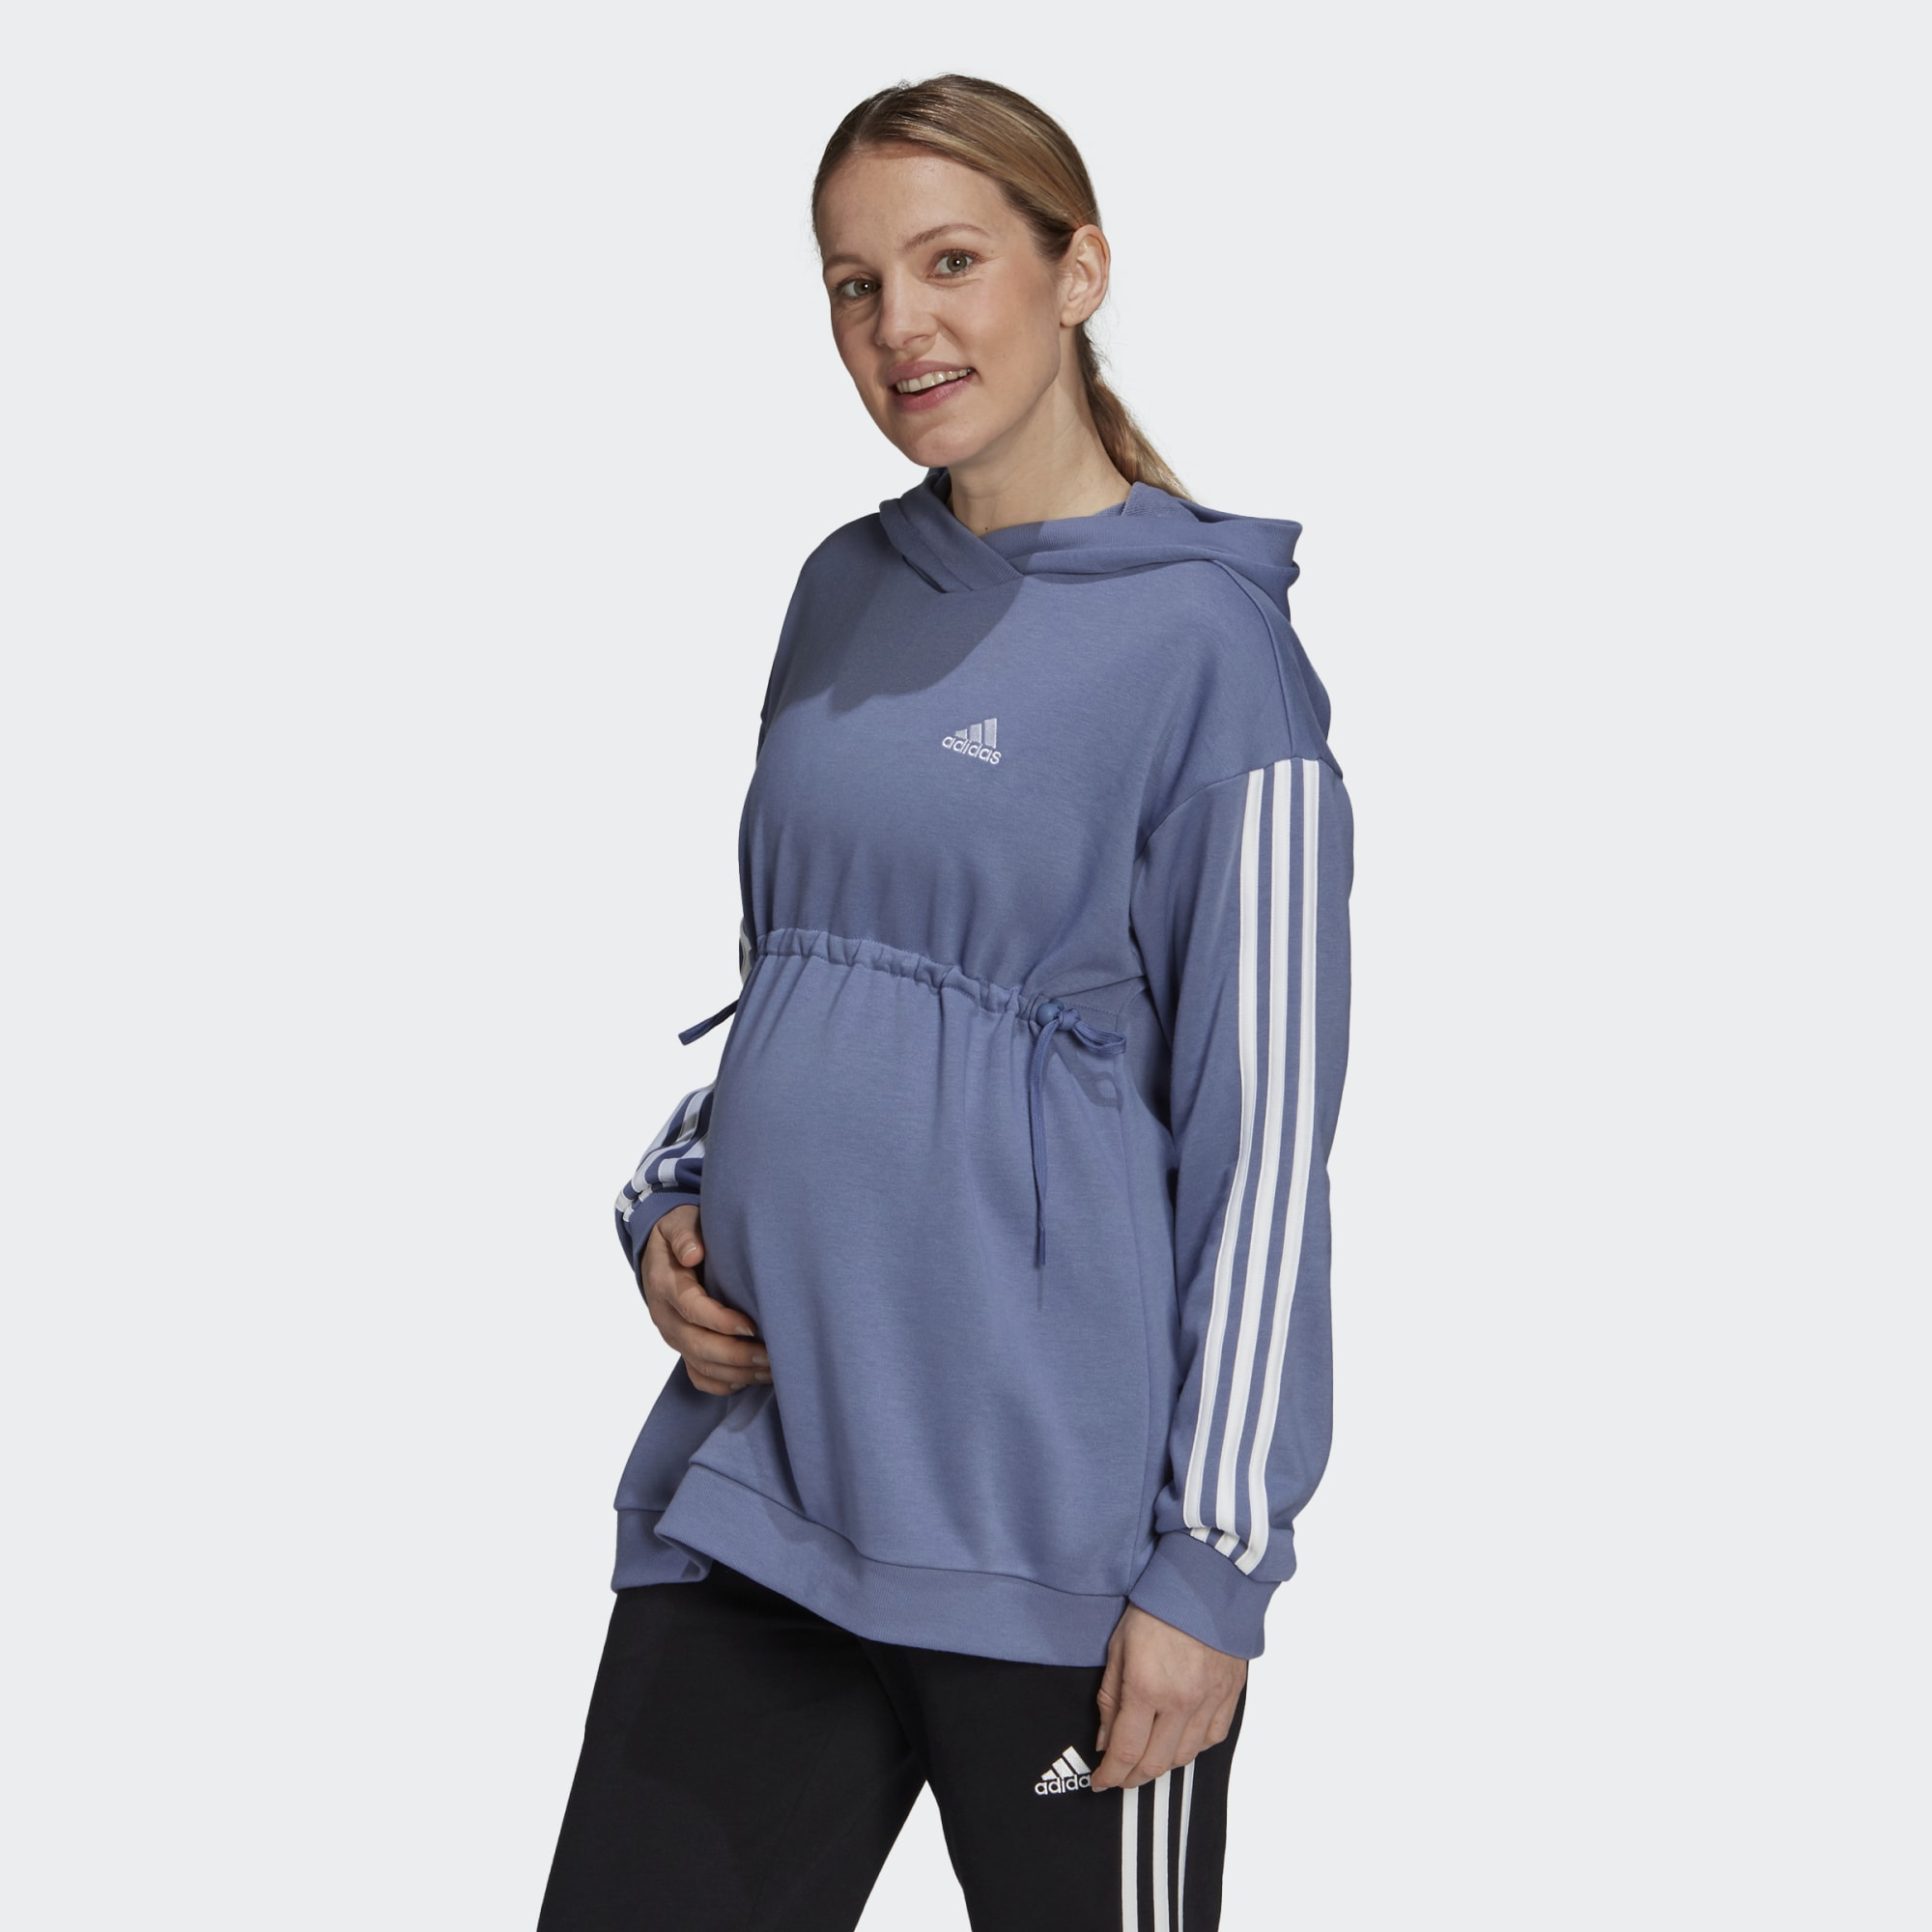 ropa deportiva embarazada